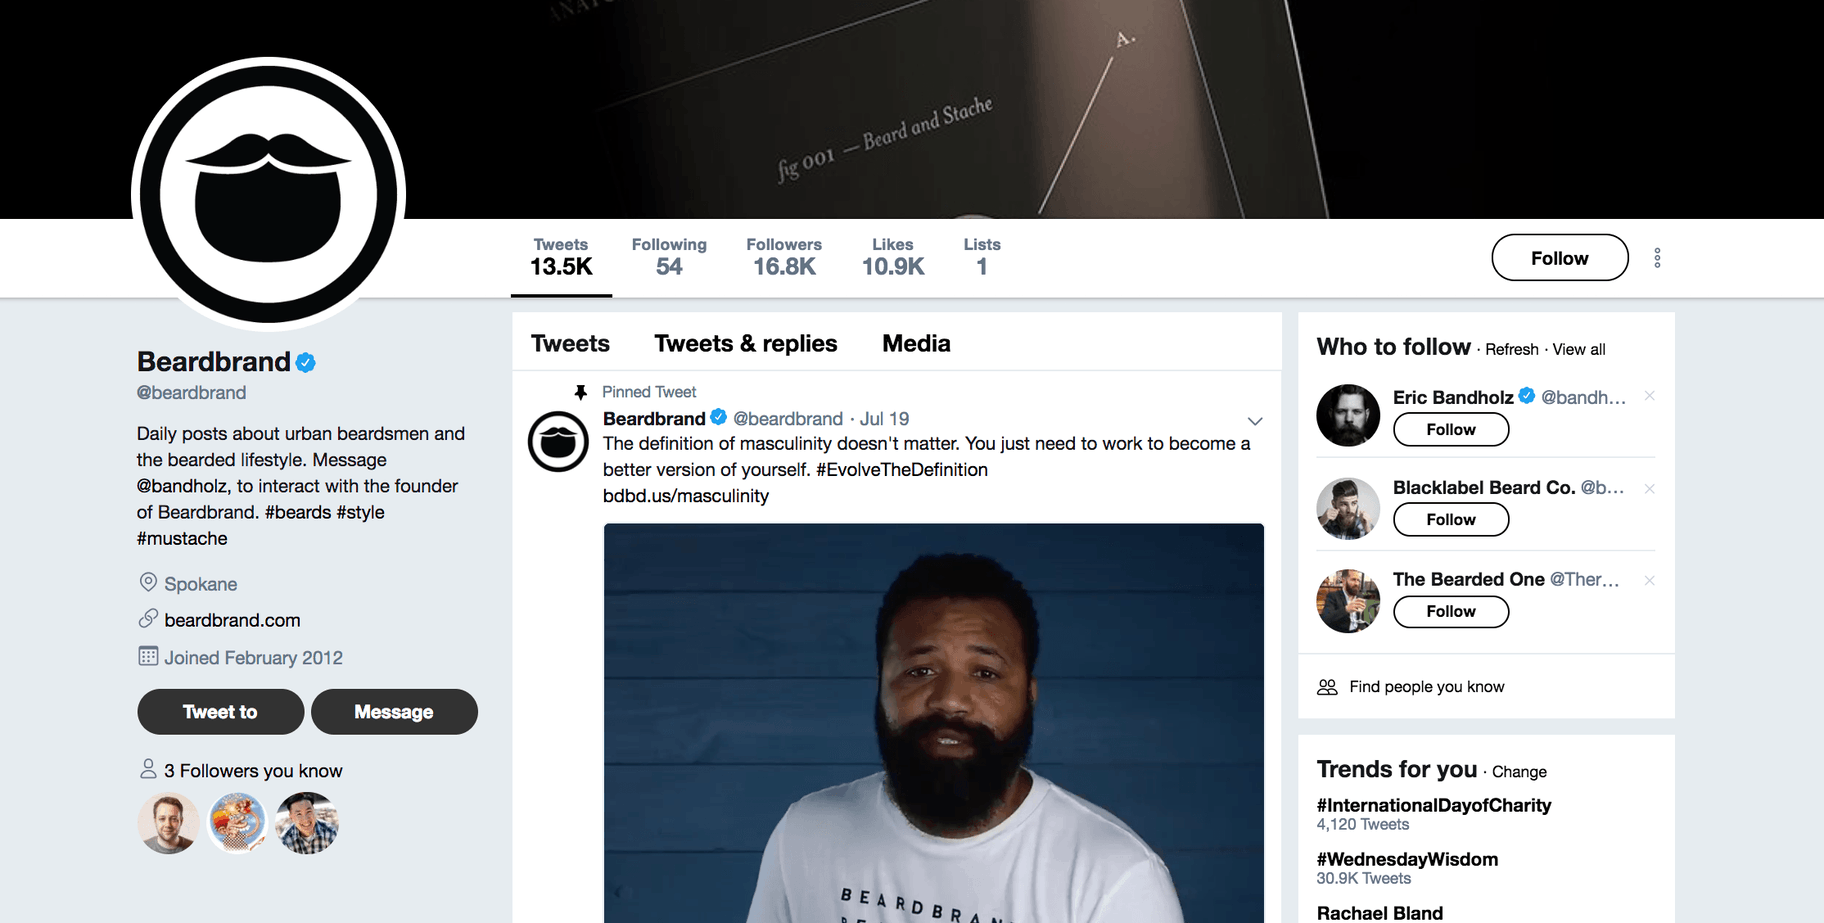 Beardbrand Twitter Profile